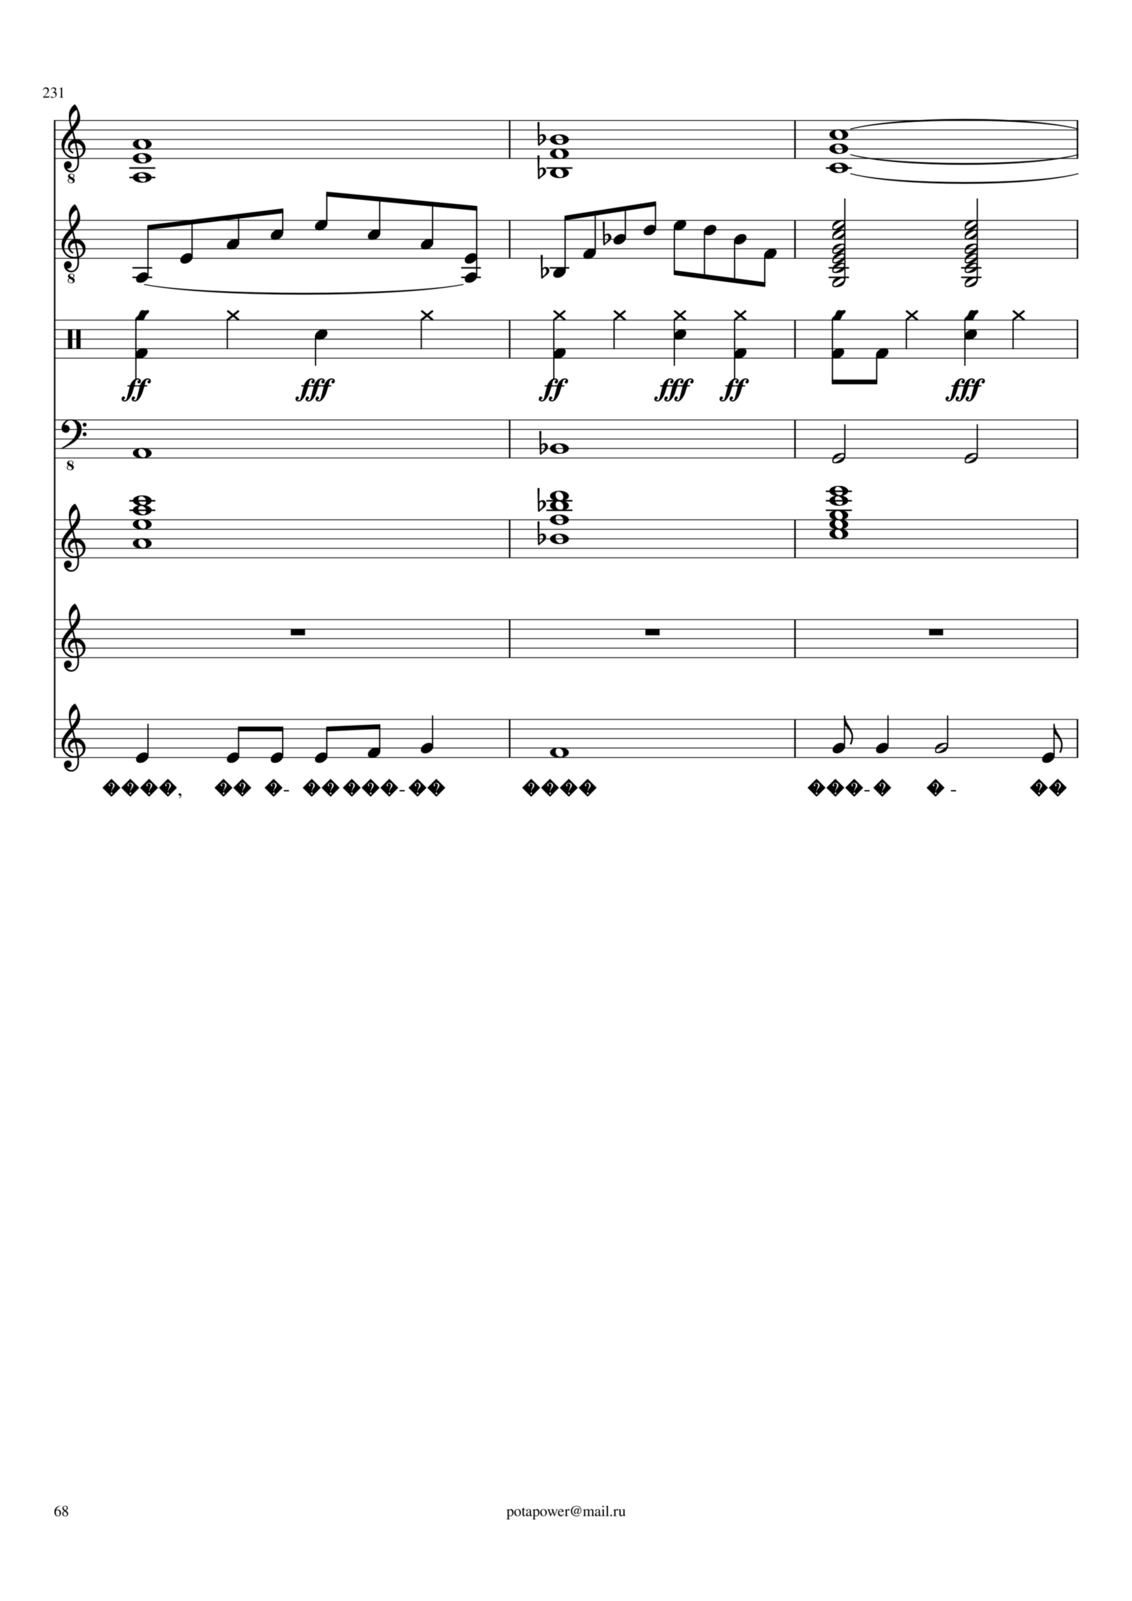 N.A.S.T.YA slide, Image 68